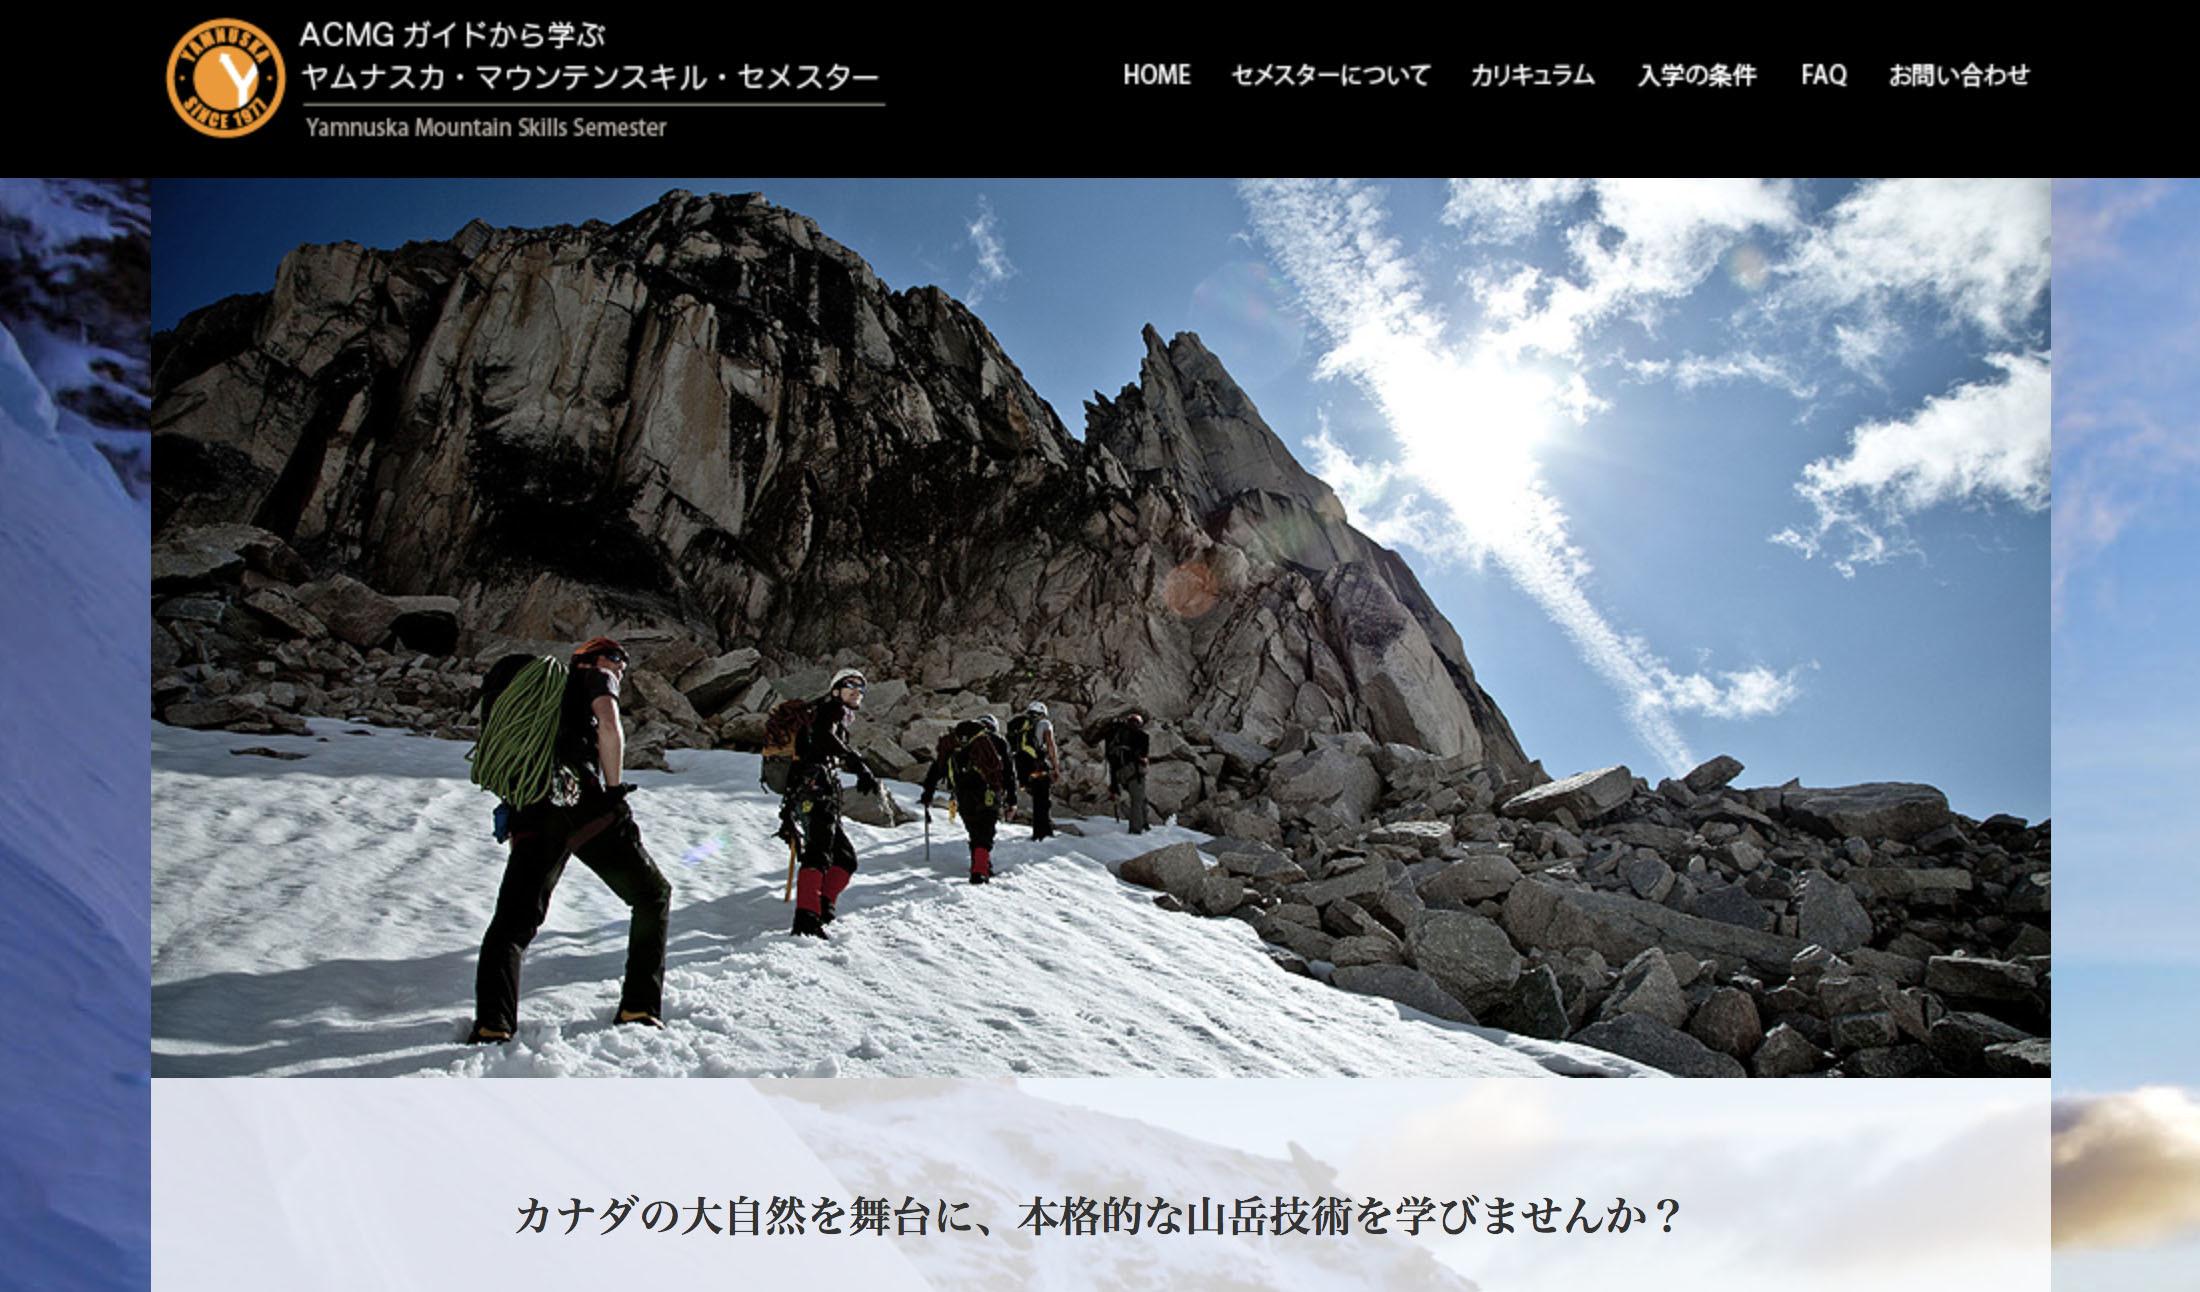 ~Yamnuska Mountain Skills Semesterを受講して感じたこと~ (記)関内 陽_d0112928_02282210.jpg